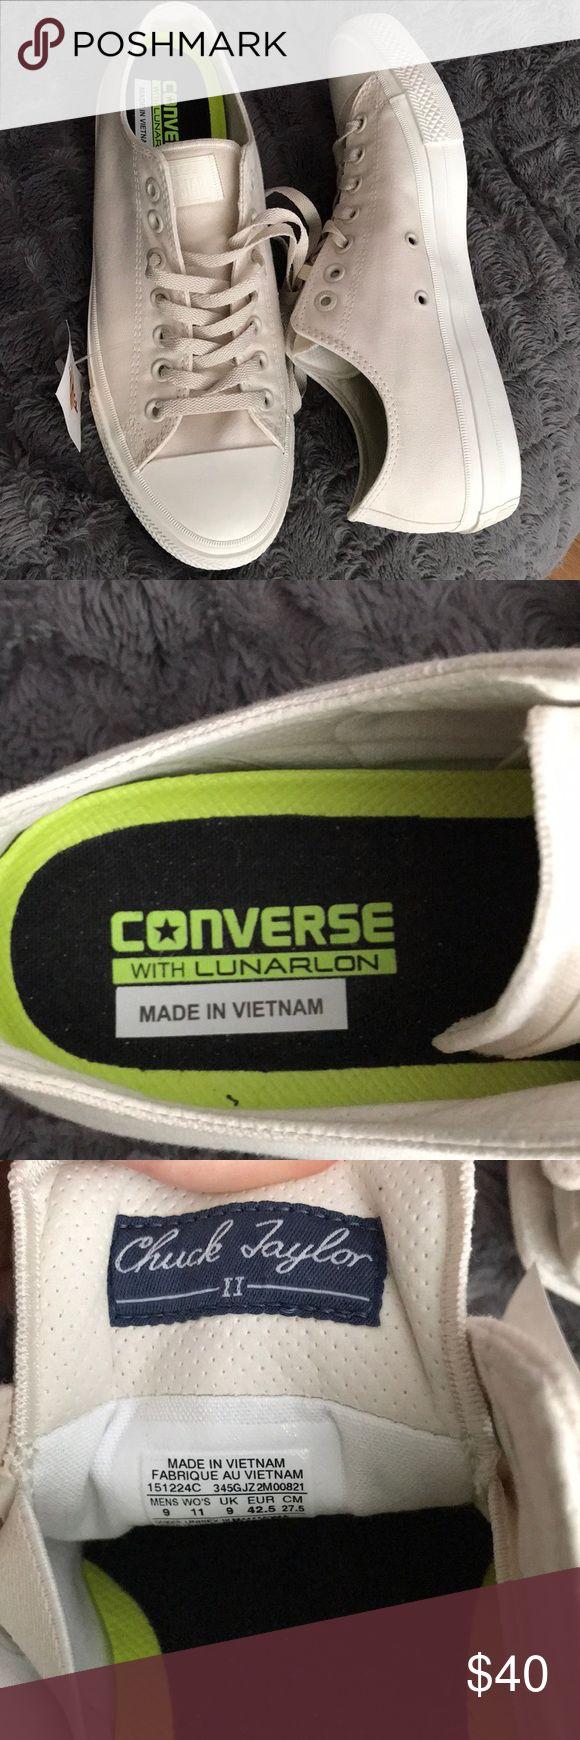 NEW Converse - Chuck Taylor II with Lunarlon   Converse chuck ...